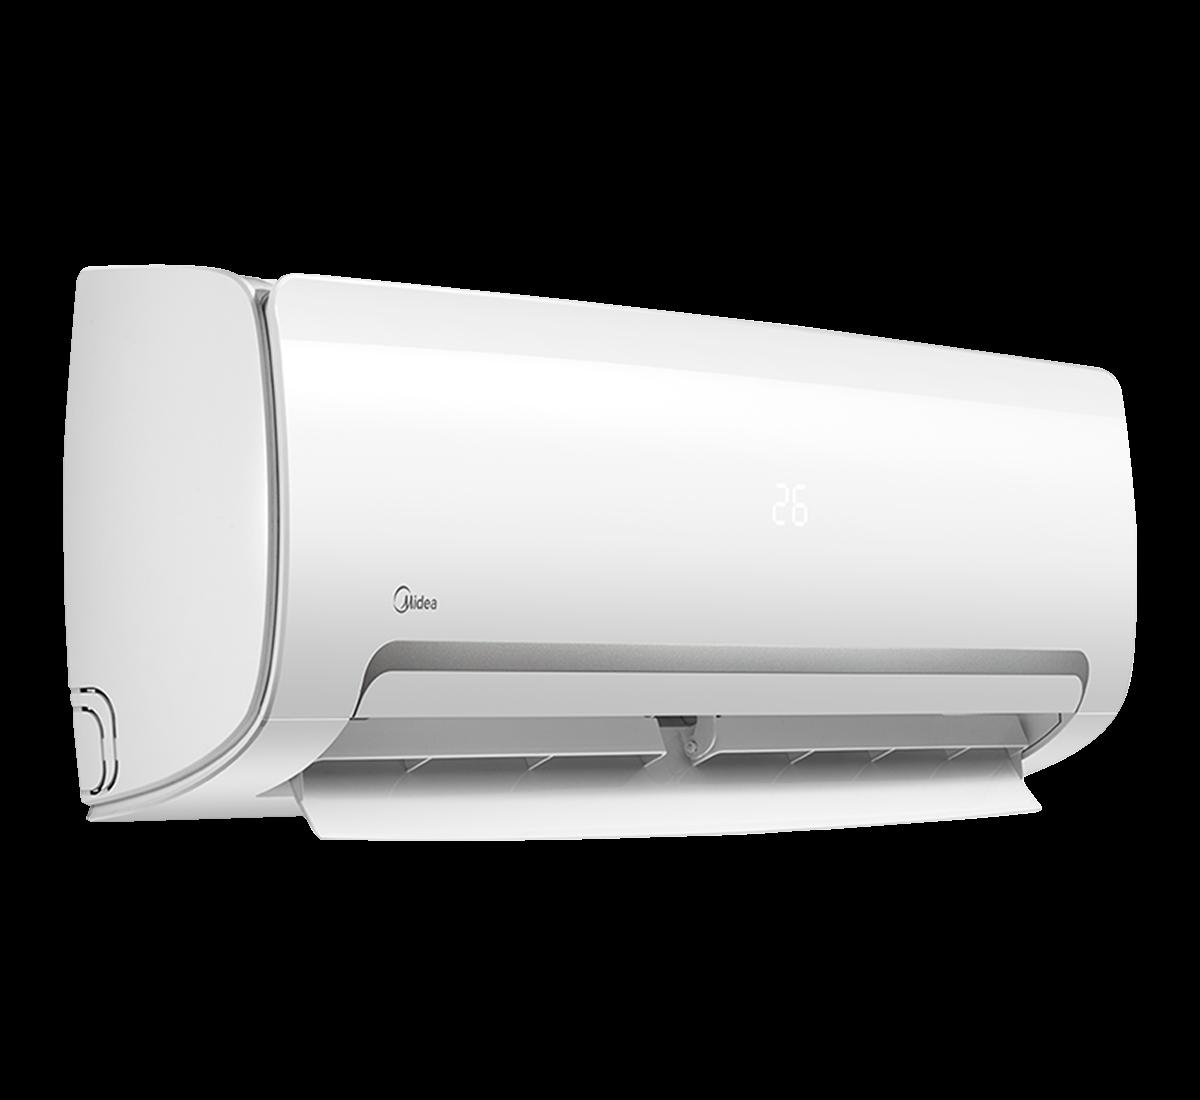 aire acondicionado unidad interior midea inverter msmbbu 12hrfn8 qrd6gw modelo mission ii 3512n8 instalacion incluida caseragua 03